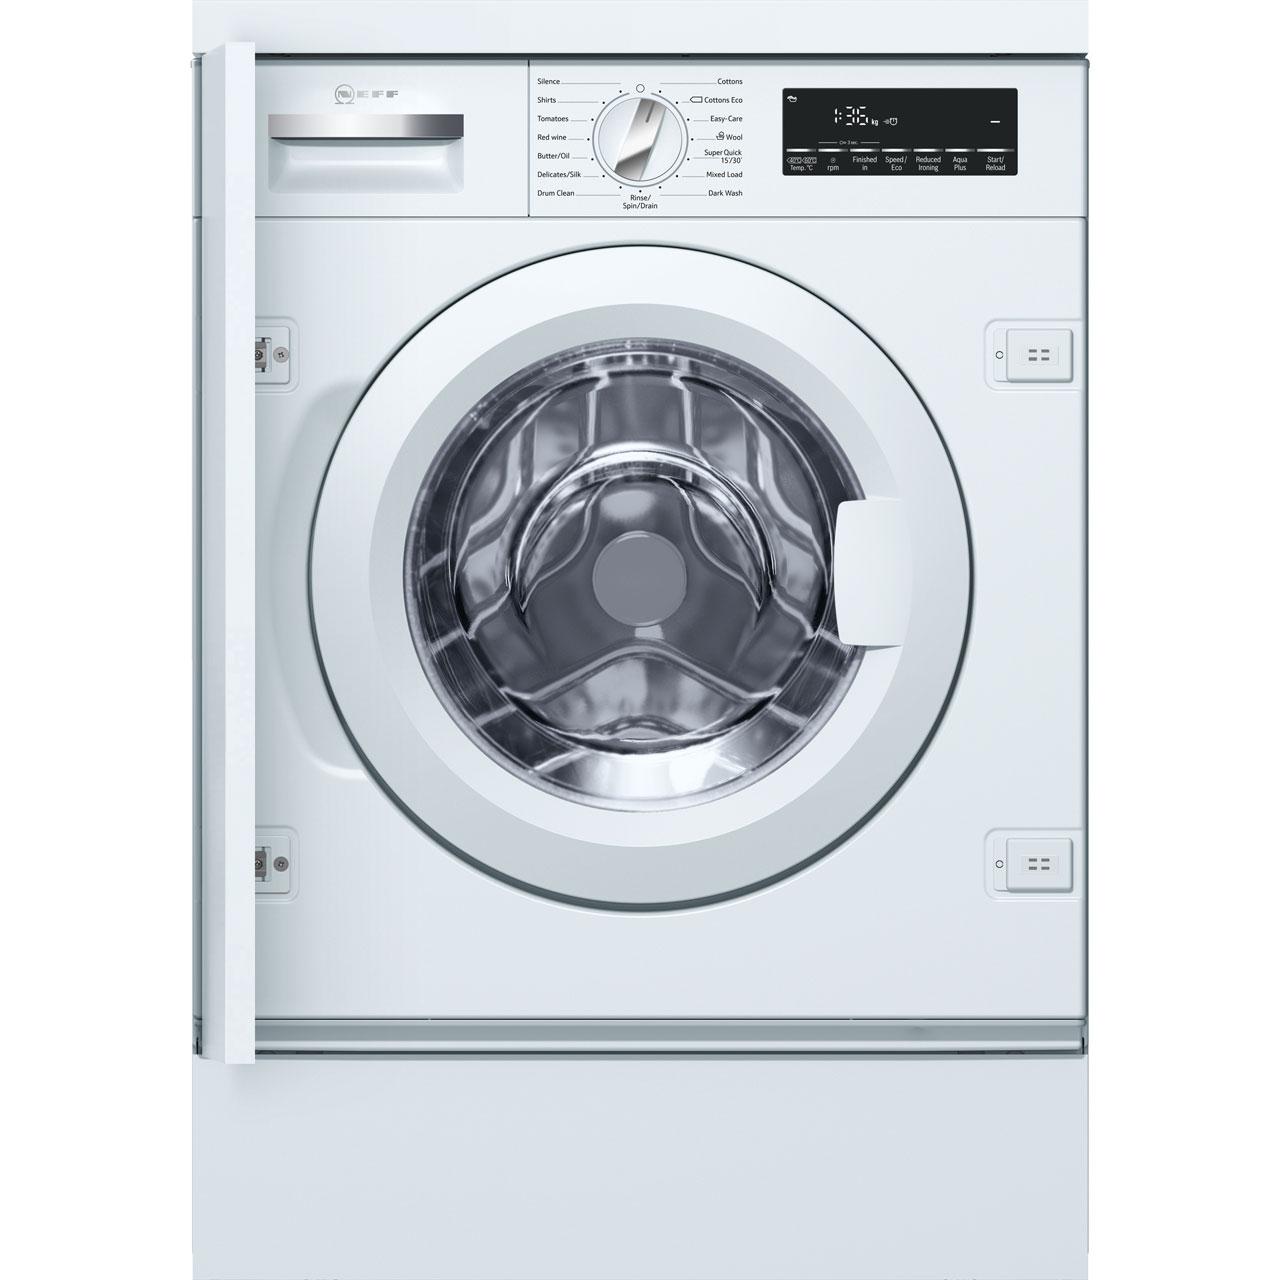 Neff W544BX0GB Integrated Washing Machine £684.30 @ AO.com via price match